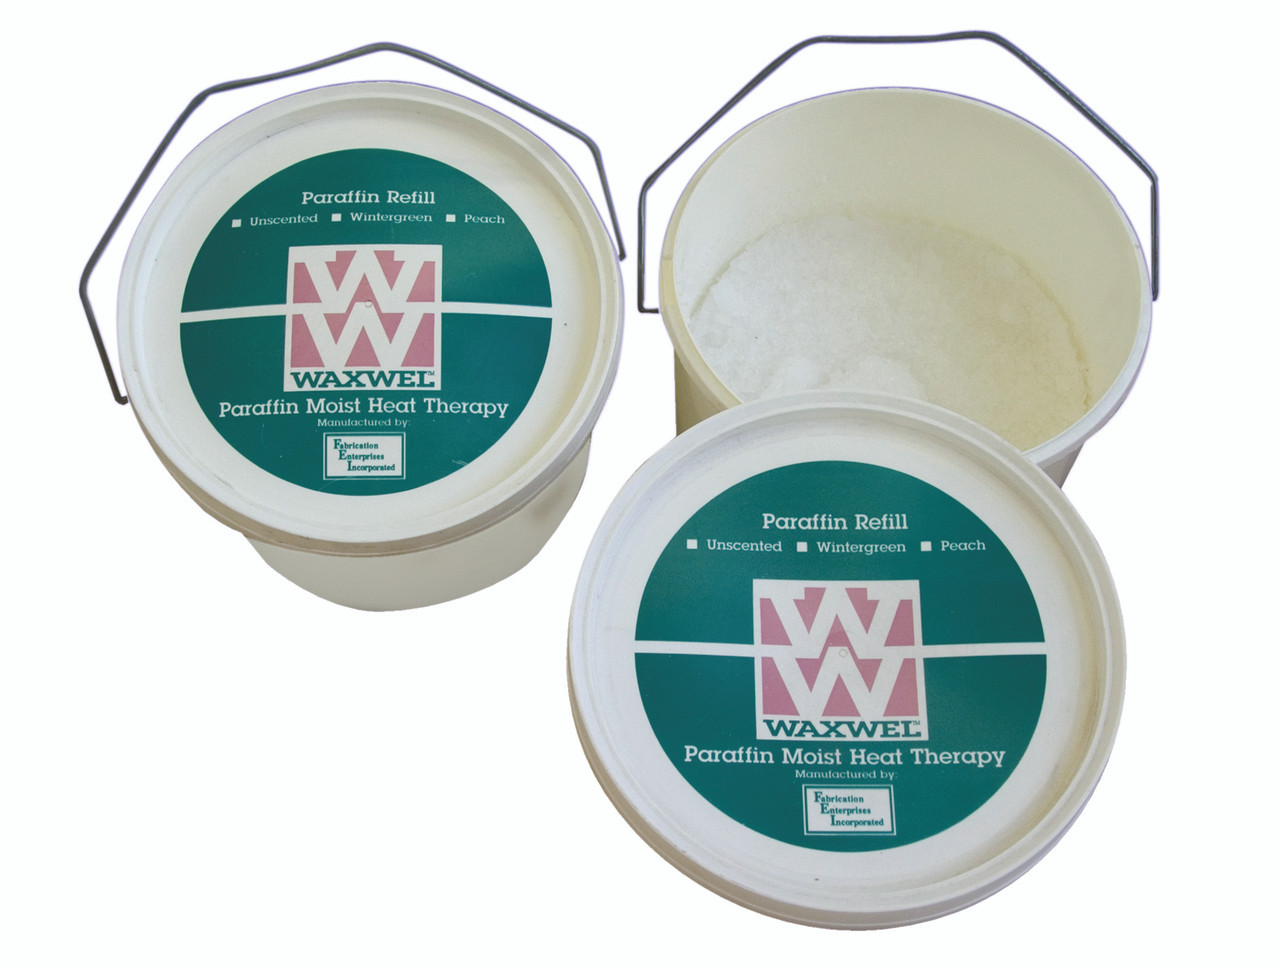 WaxWel¨ Paraffin - 1 x 3-lb Tub of Pastilles - Wintergreen Fragrance